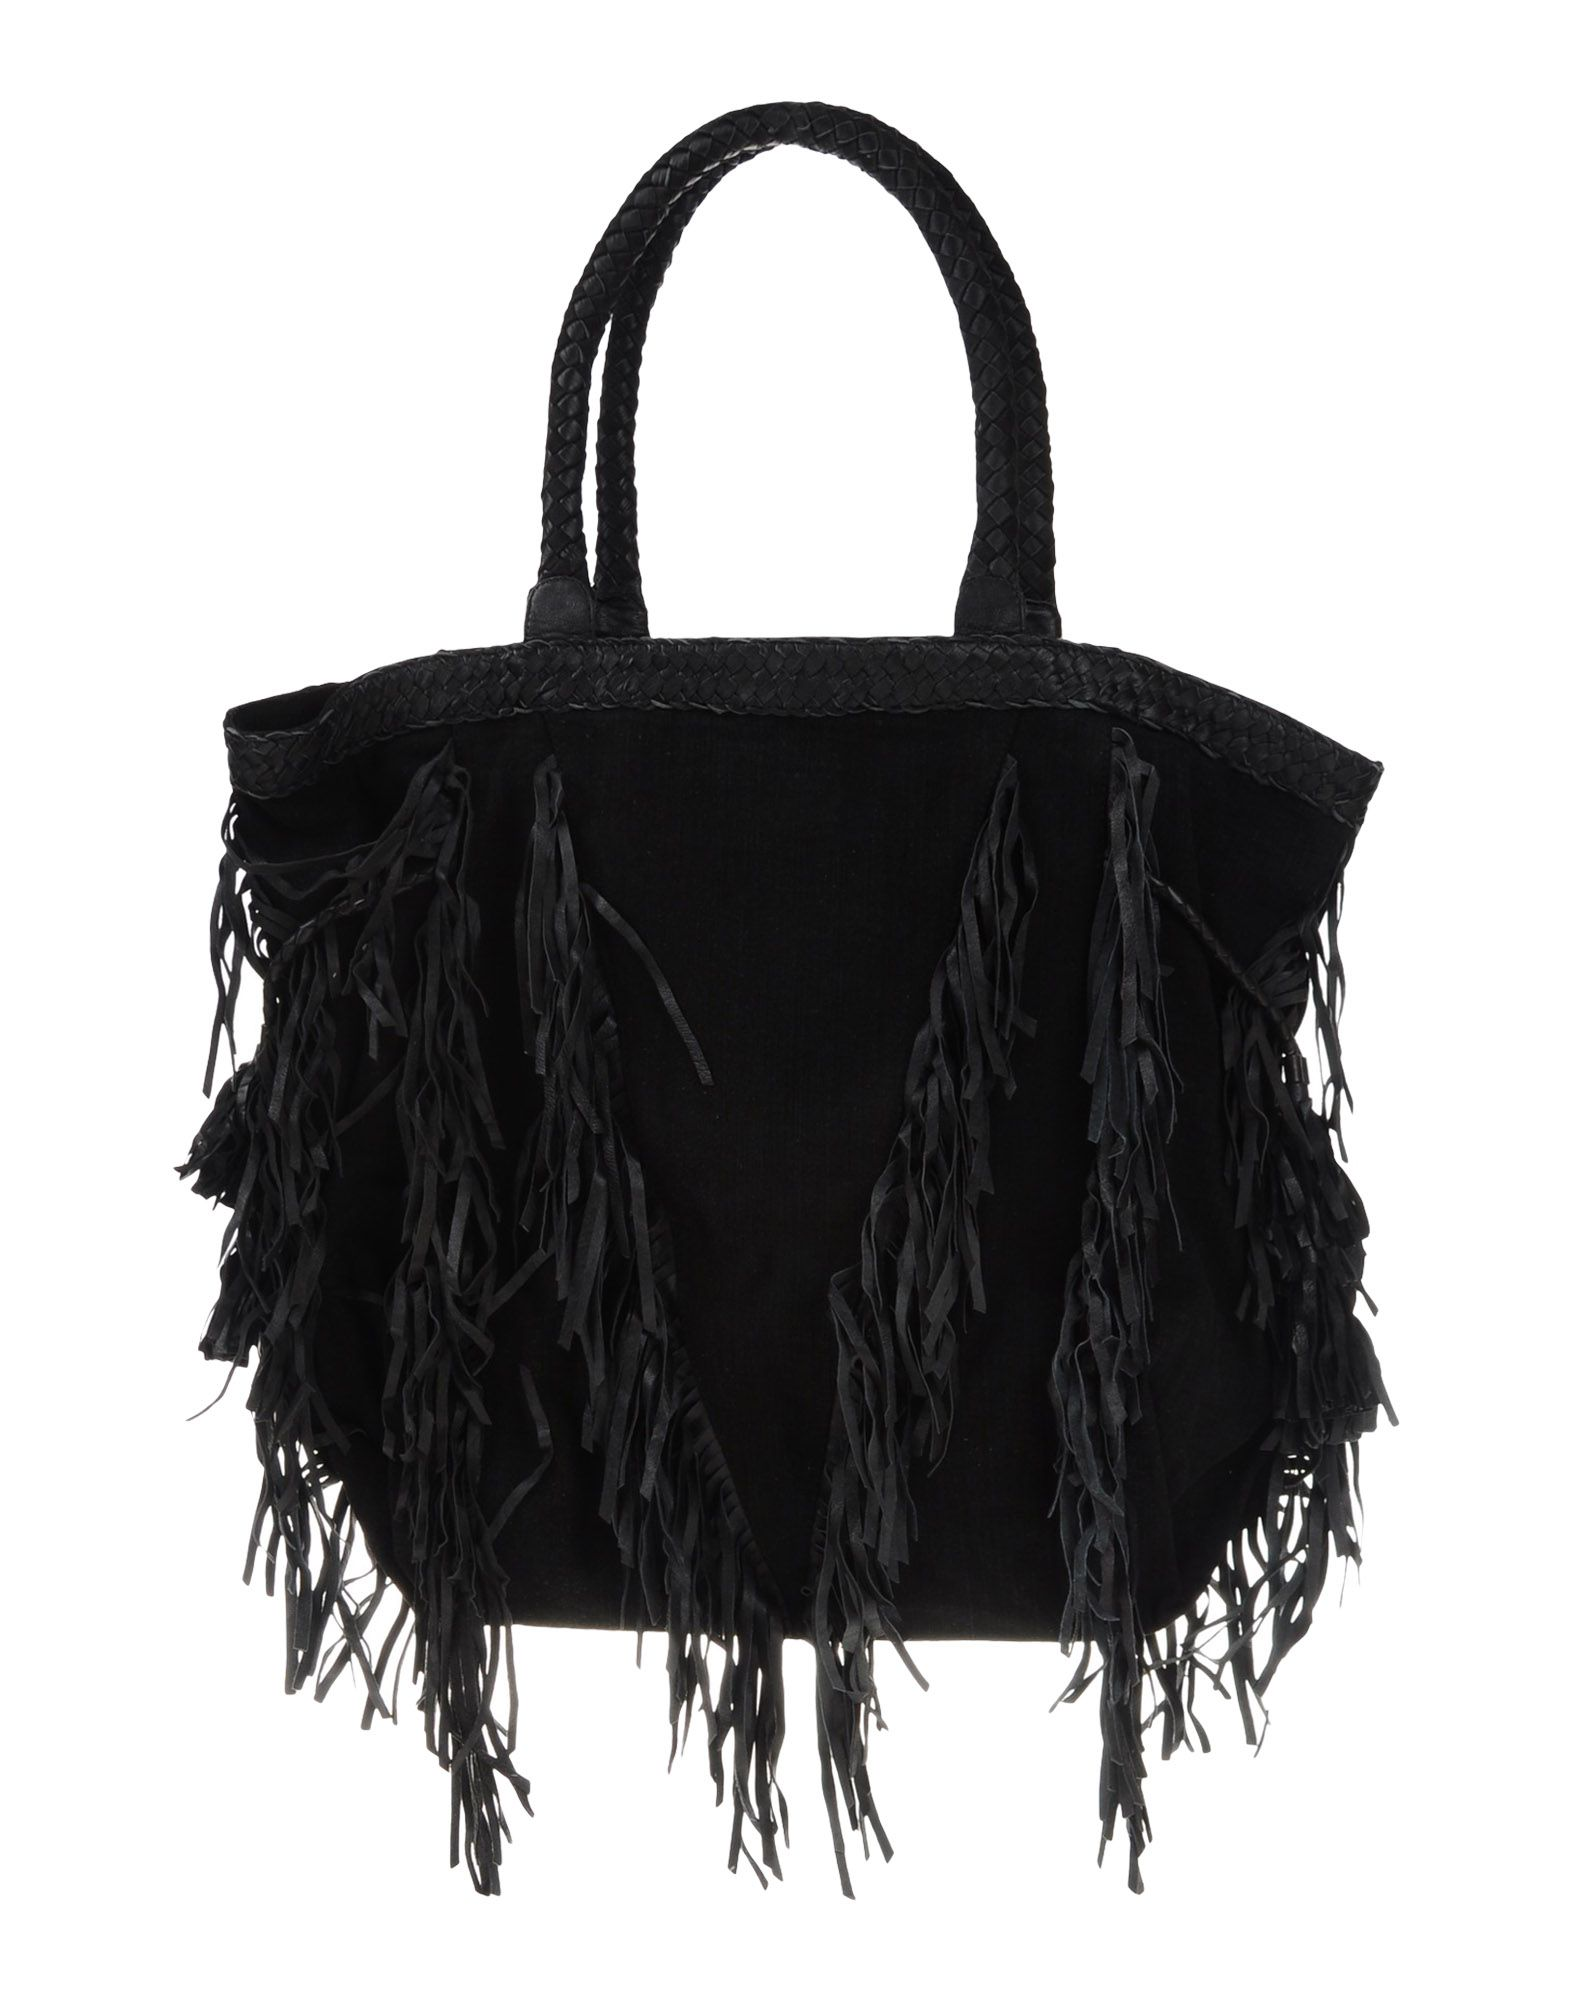 CHANCE Сумка на руку аксессуар сумка 15 6 brauberg chance black 240458